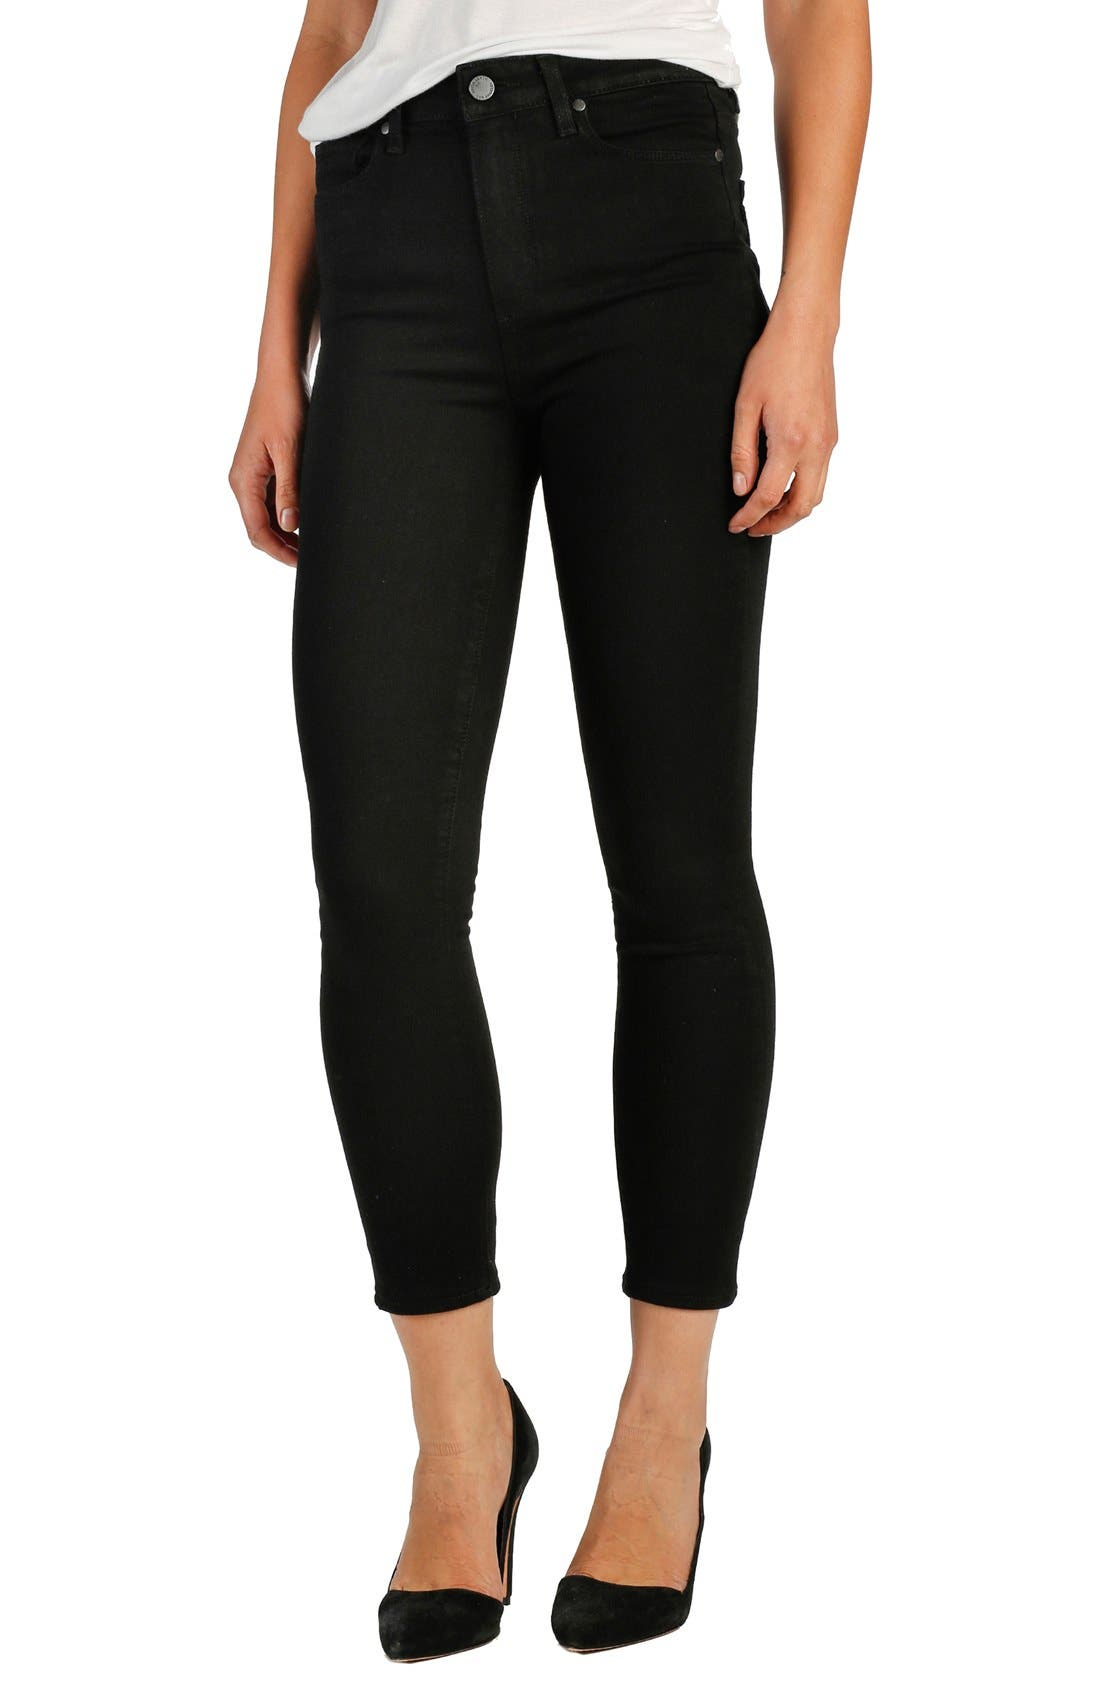 Alternate Image 1 Selected - PAIGE Transcend - Margot High Waist Crop Ultra Skinny Jeans (Black Shadow)